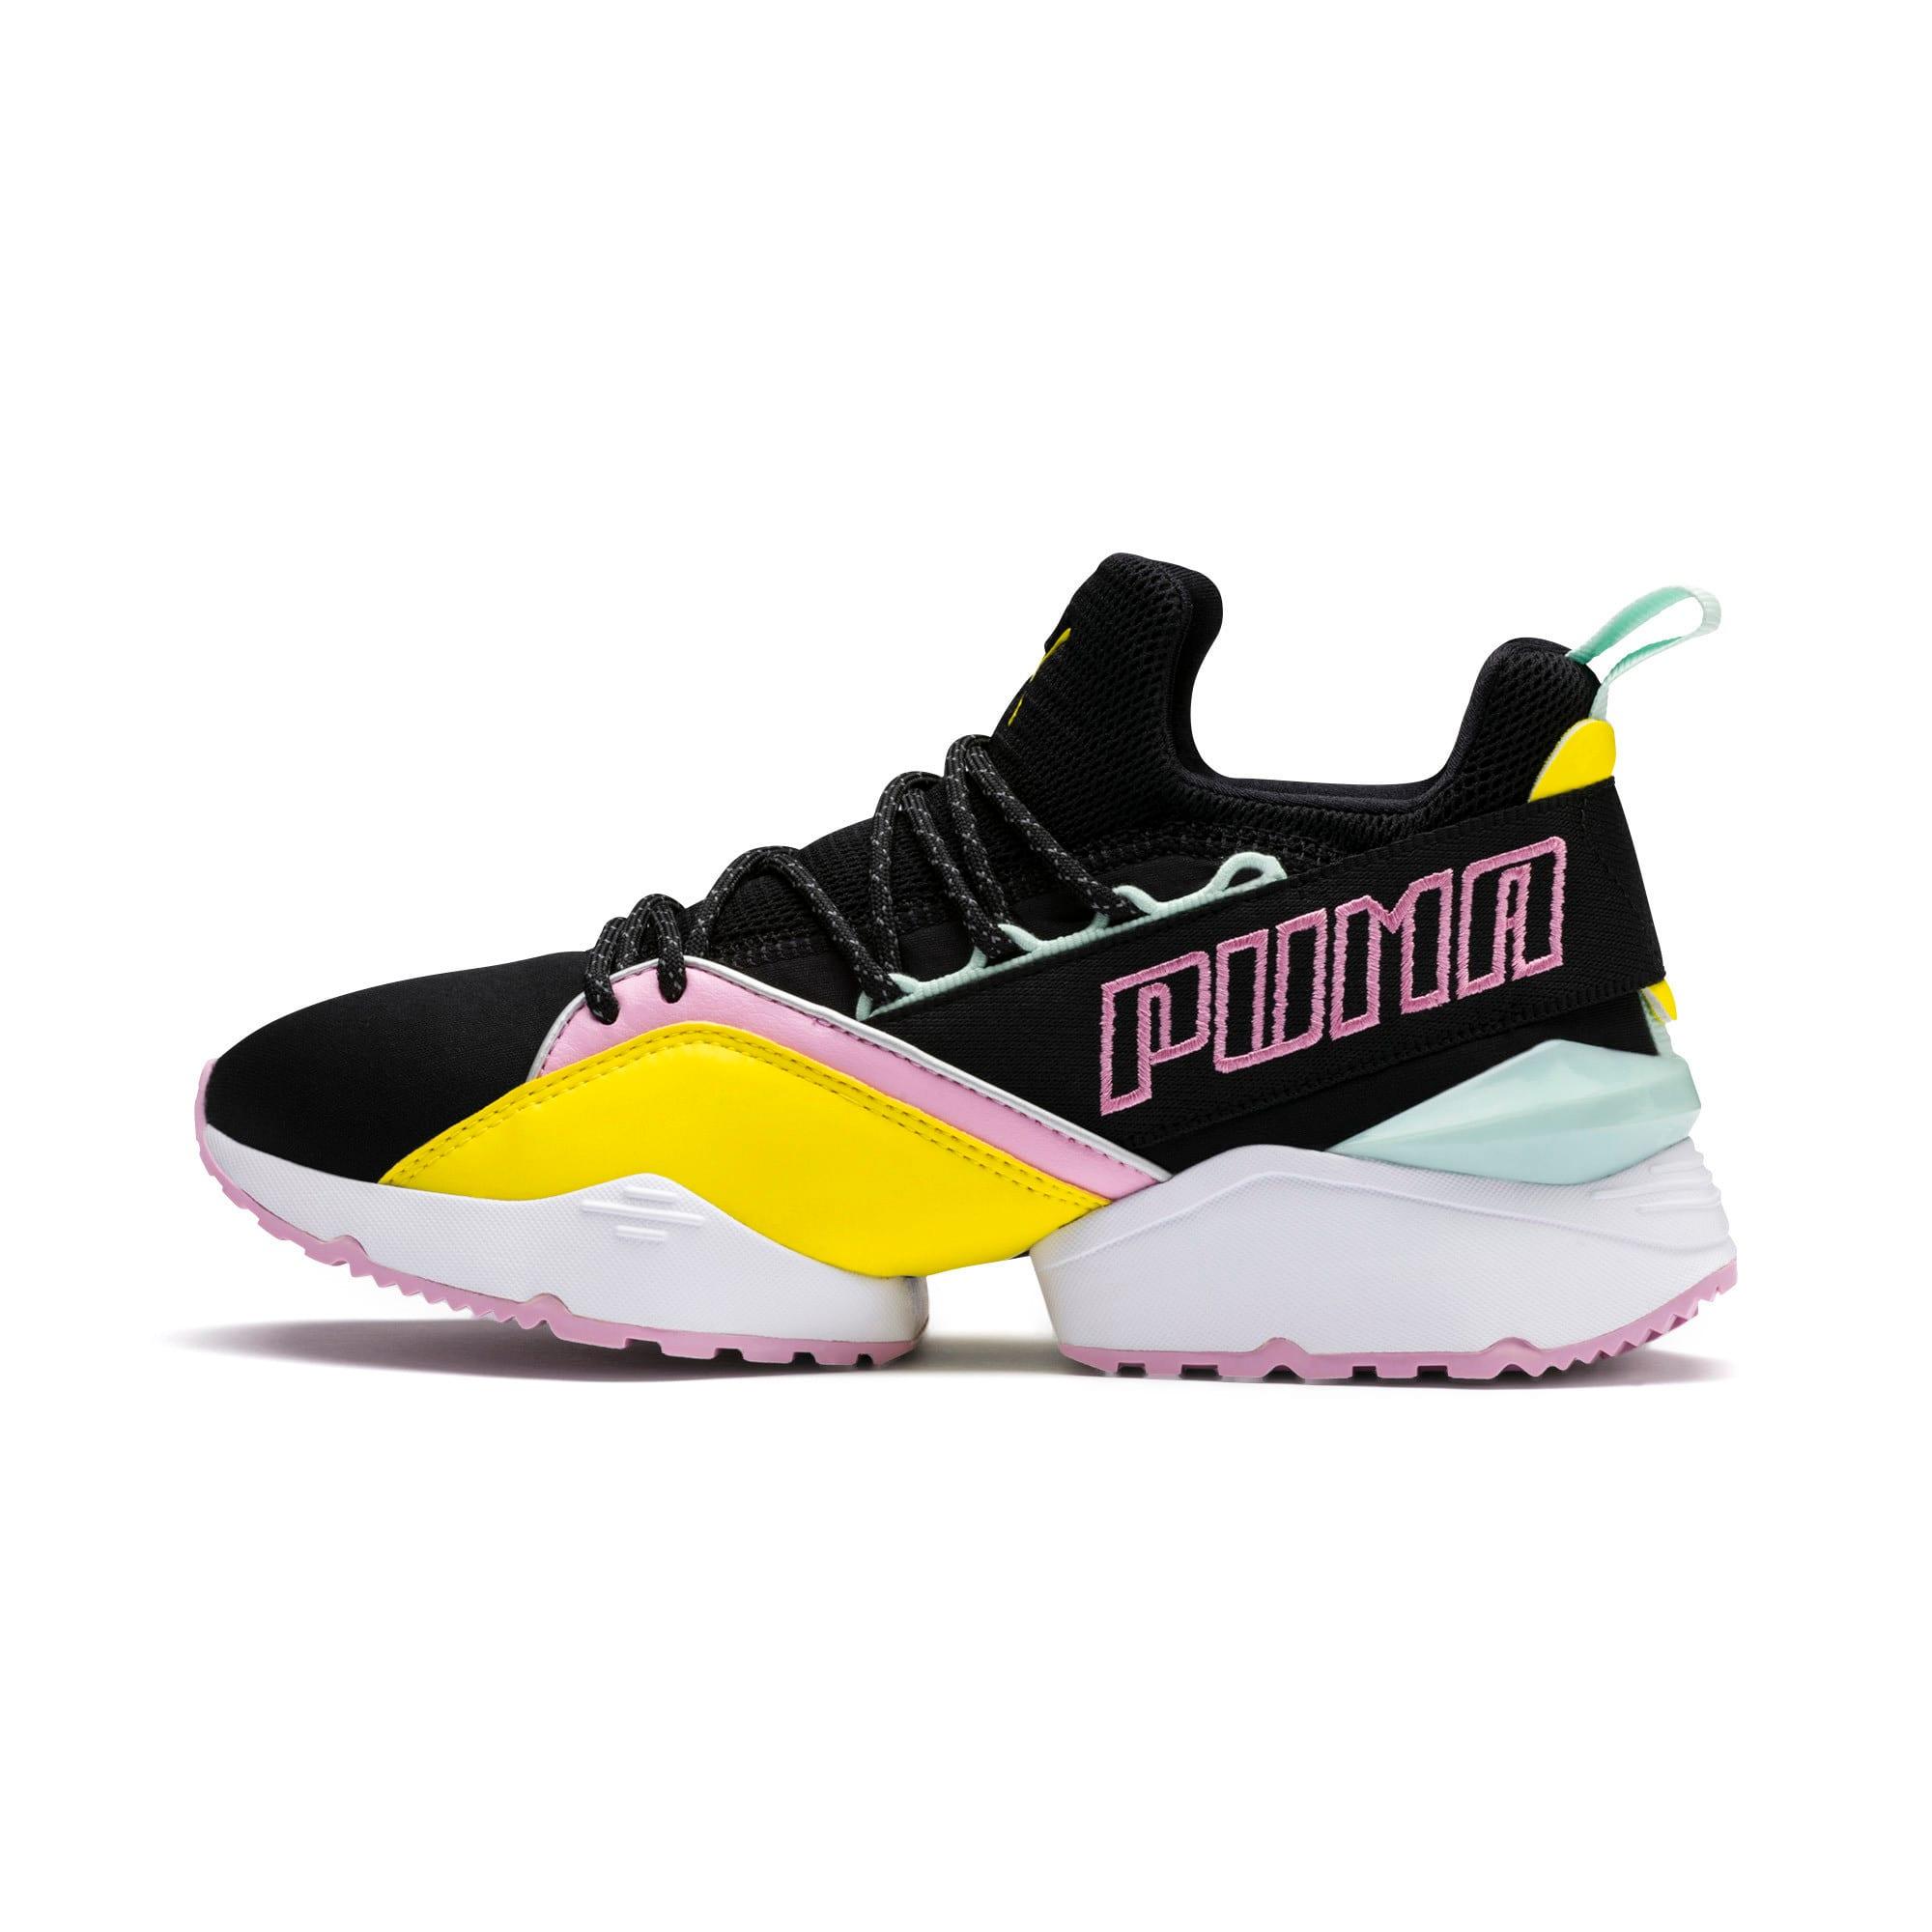 Thumbnail 1 of Muse Maia TZ Damen Sneaker, Puma Black-Blazing Yellow, medium